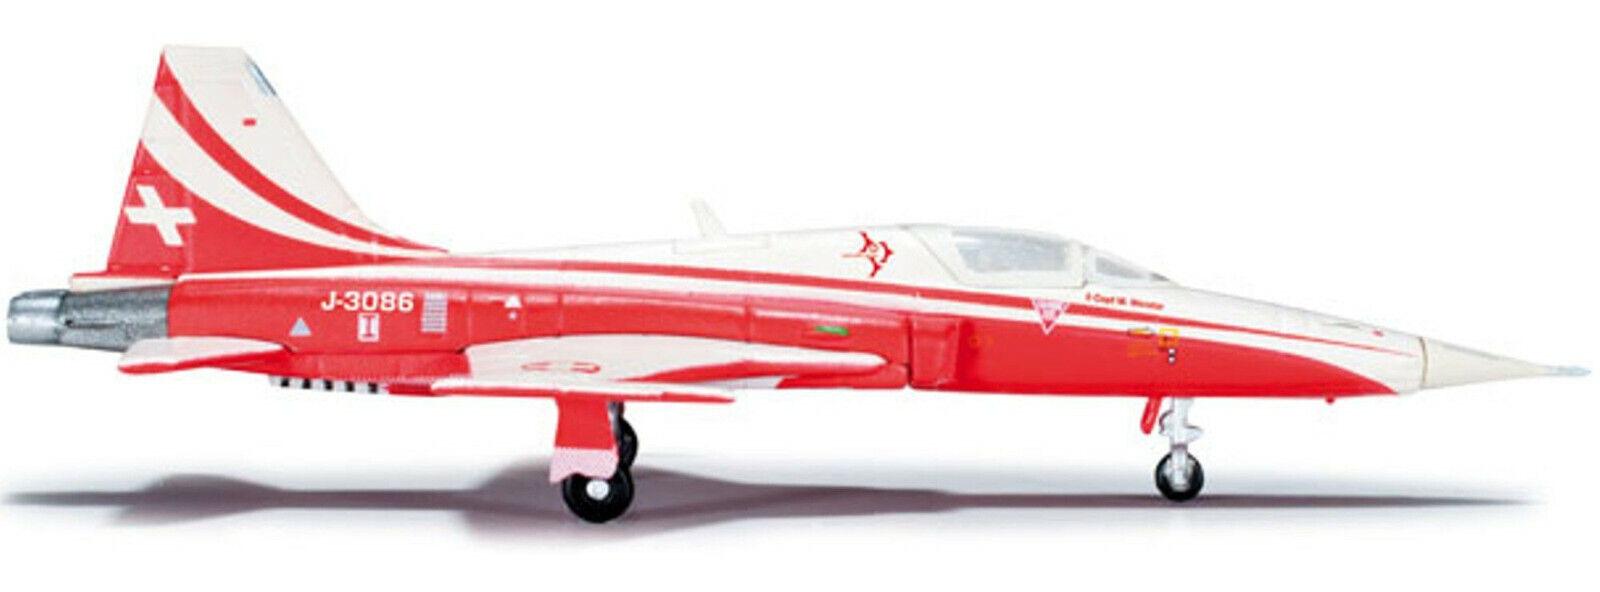 1 200 Herpa Wings 555289 Northrop f5e Tiger II, ricognizione Suisse Tiger Cinque